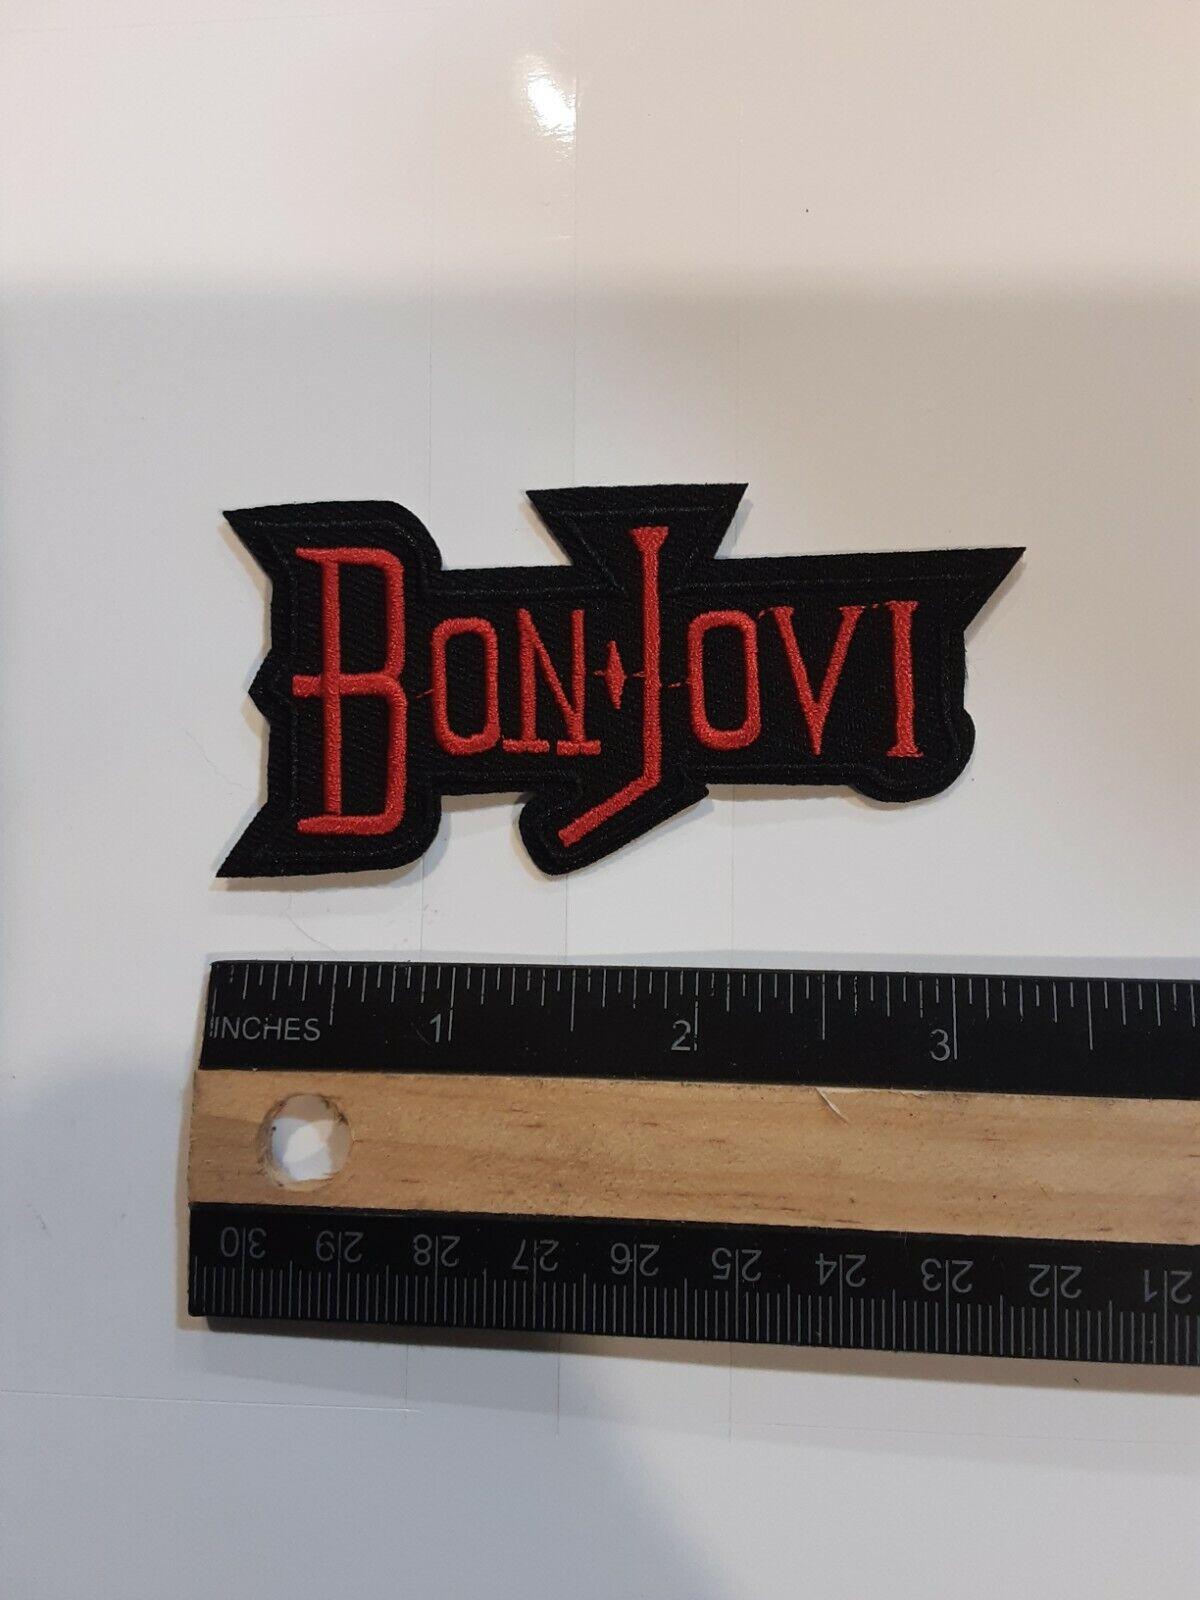 BON JOVI EMBROIDERED IRON ON PATCH  - $4.99